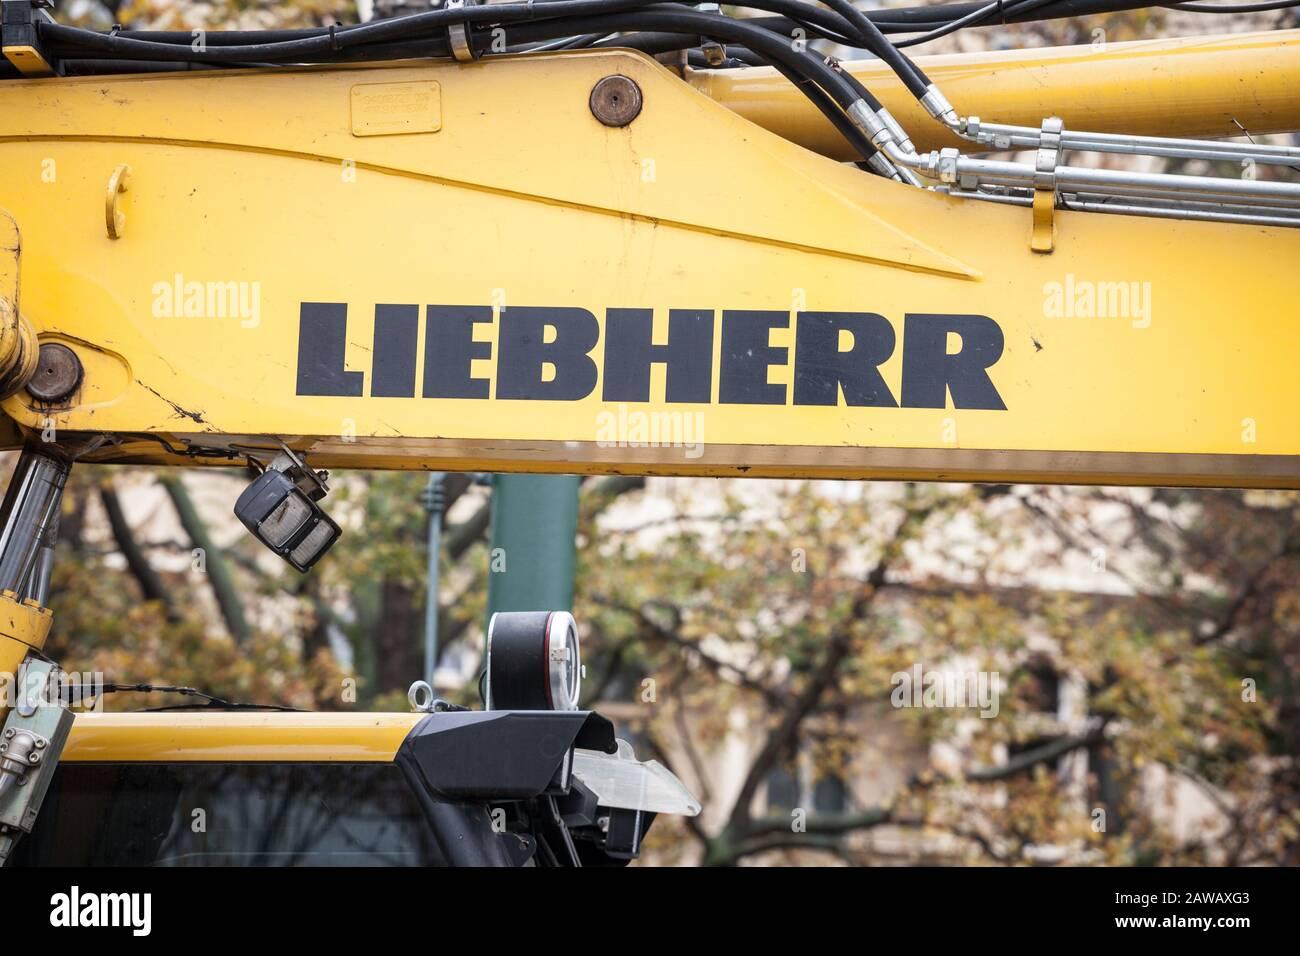 PRAGUE, CZECHIA - NOVEMBER 3, 2019: Liebherr logo on some equipment machinery on a construction site in Prague. Liebherr is a German Swiss manufacture Stock Photo